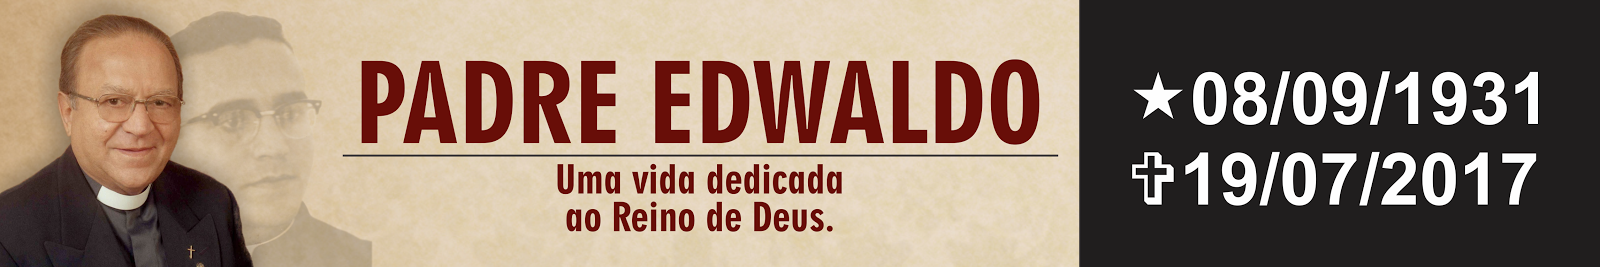 Padre Edwaldo